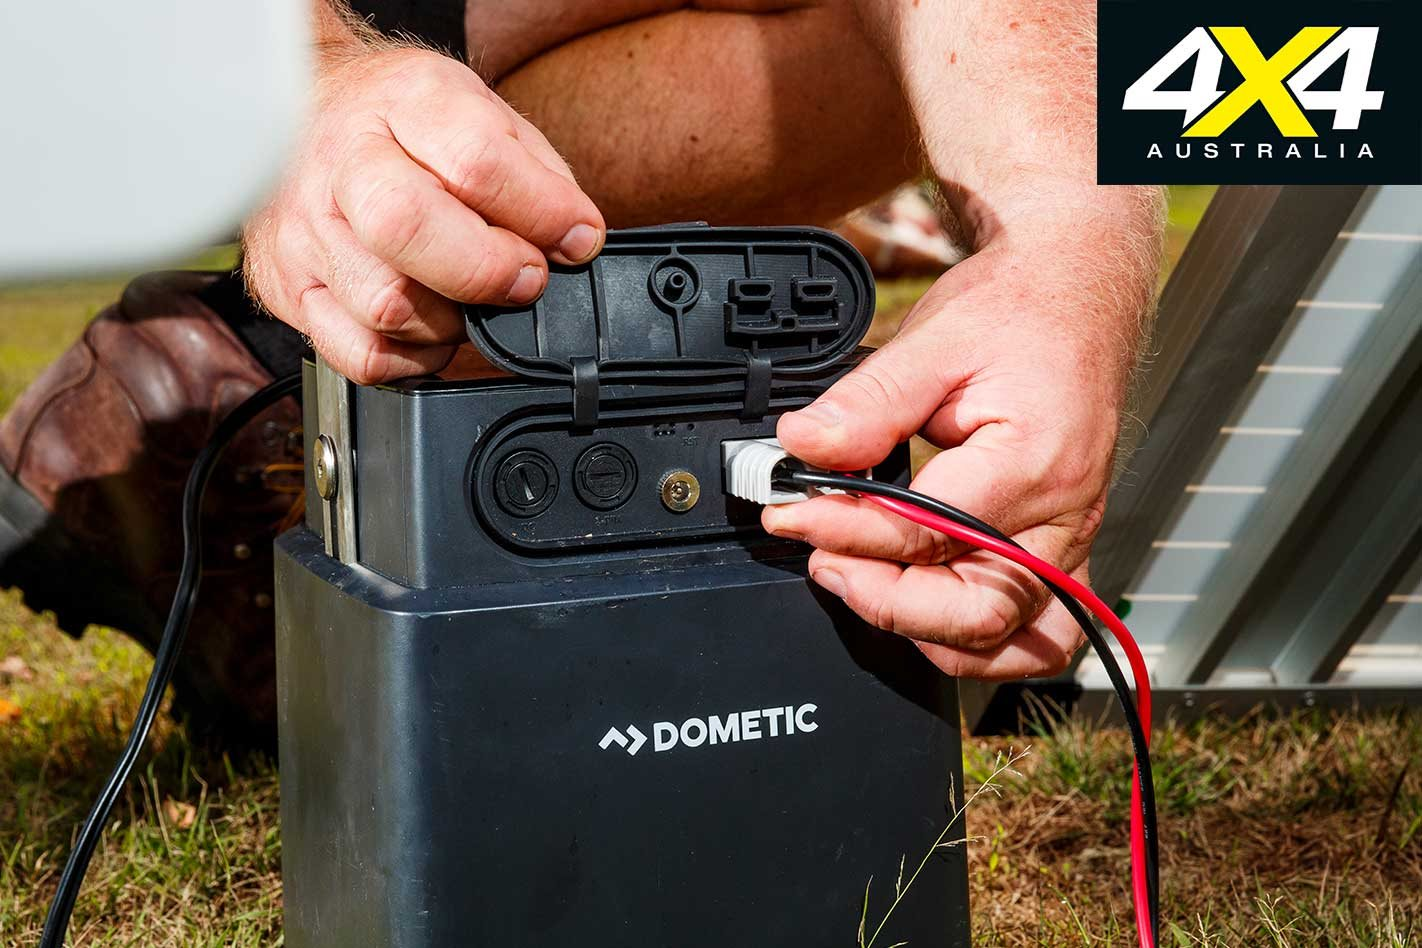 Dometic CFX 50W Fridge/Freezer: 4x4 product test